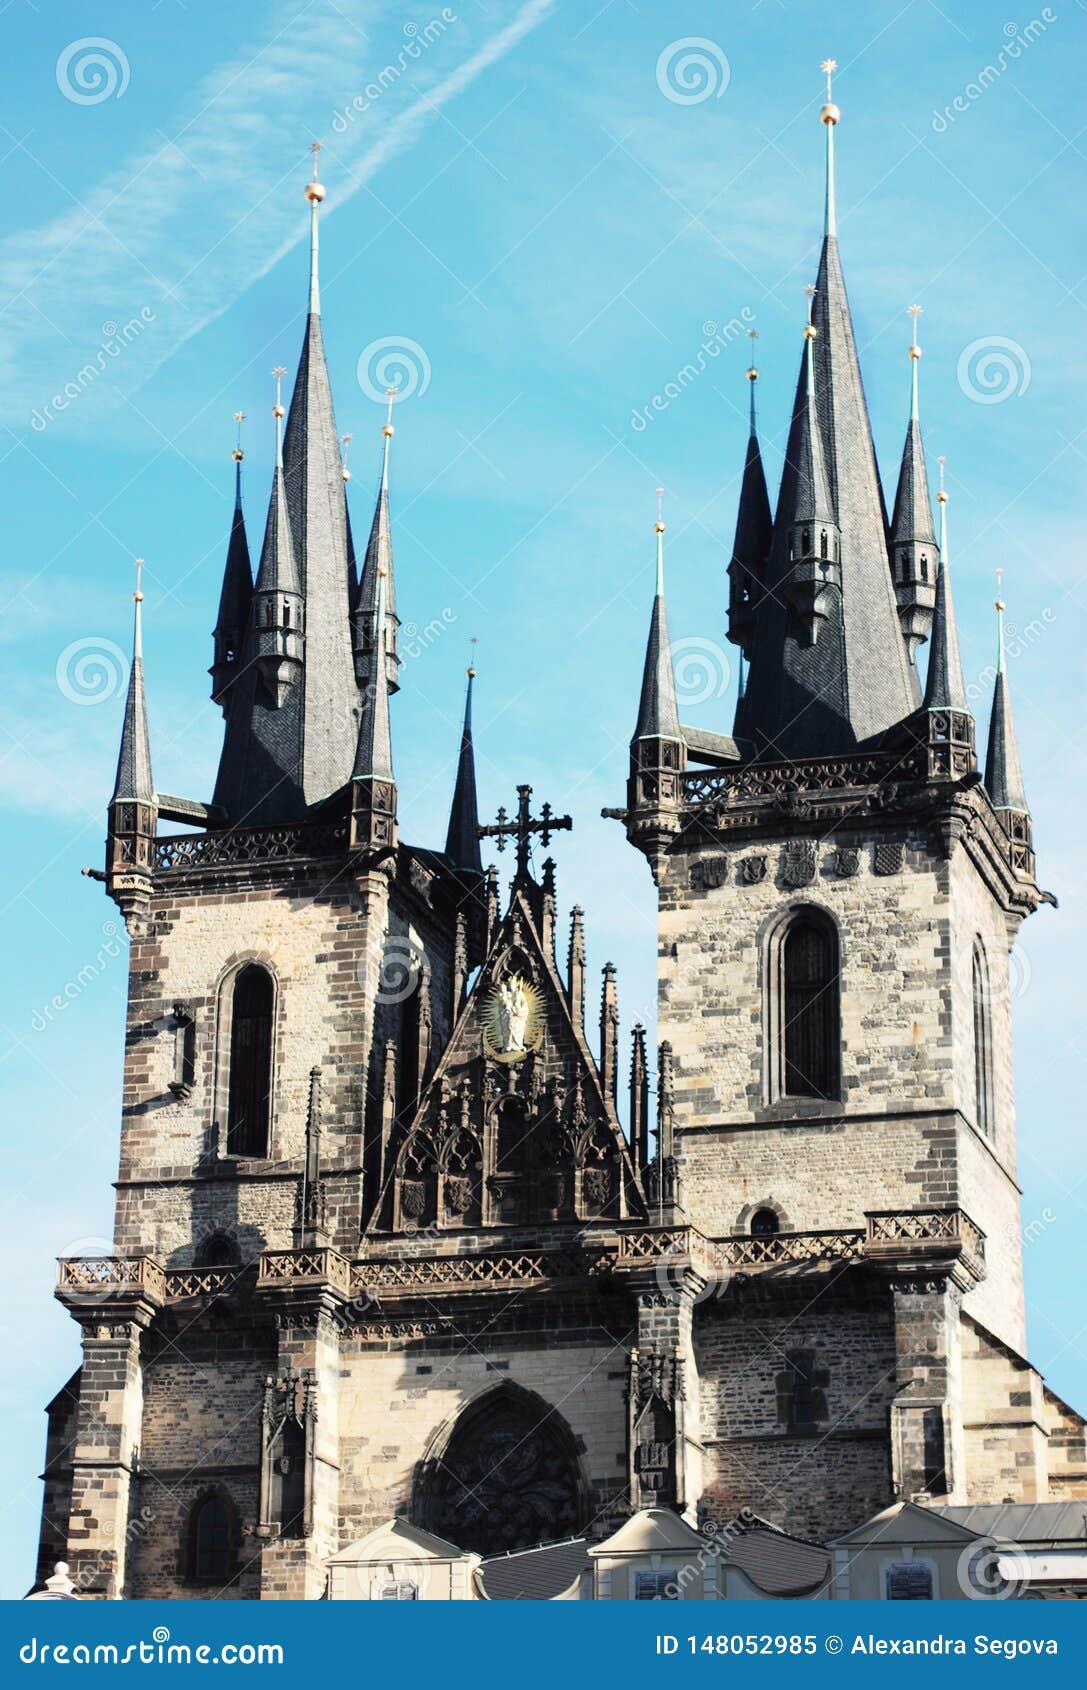 Two castle towers in bright blue sky in Prague, Czech Republic. Popular sightseen. Staromest